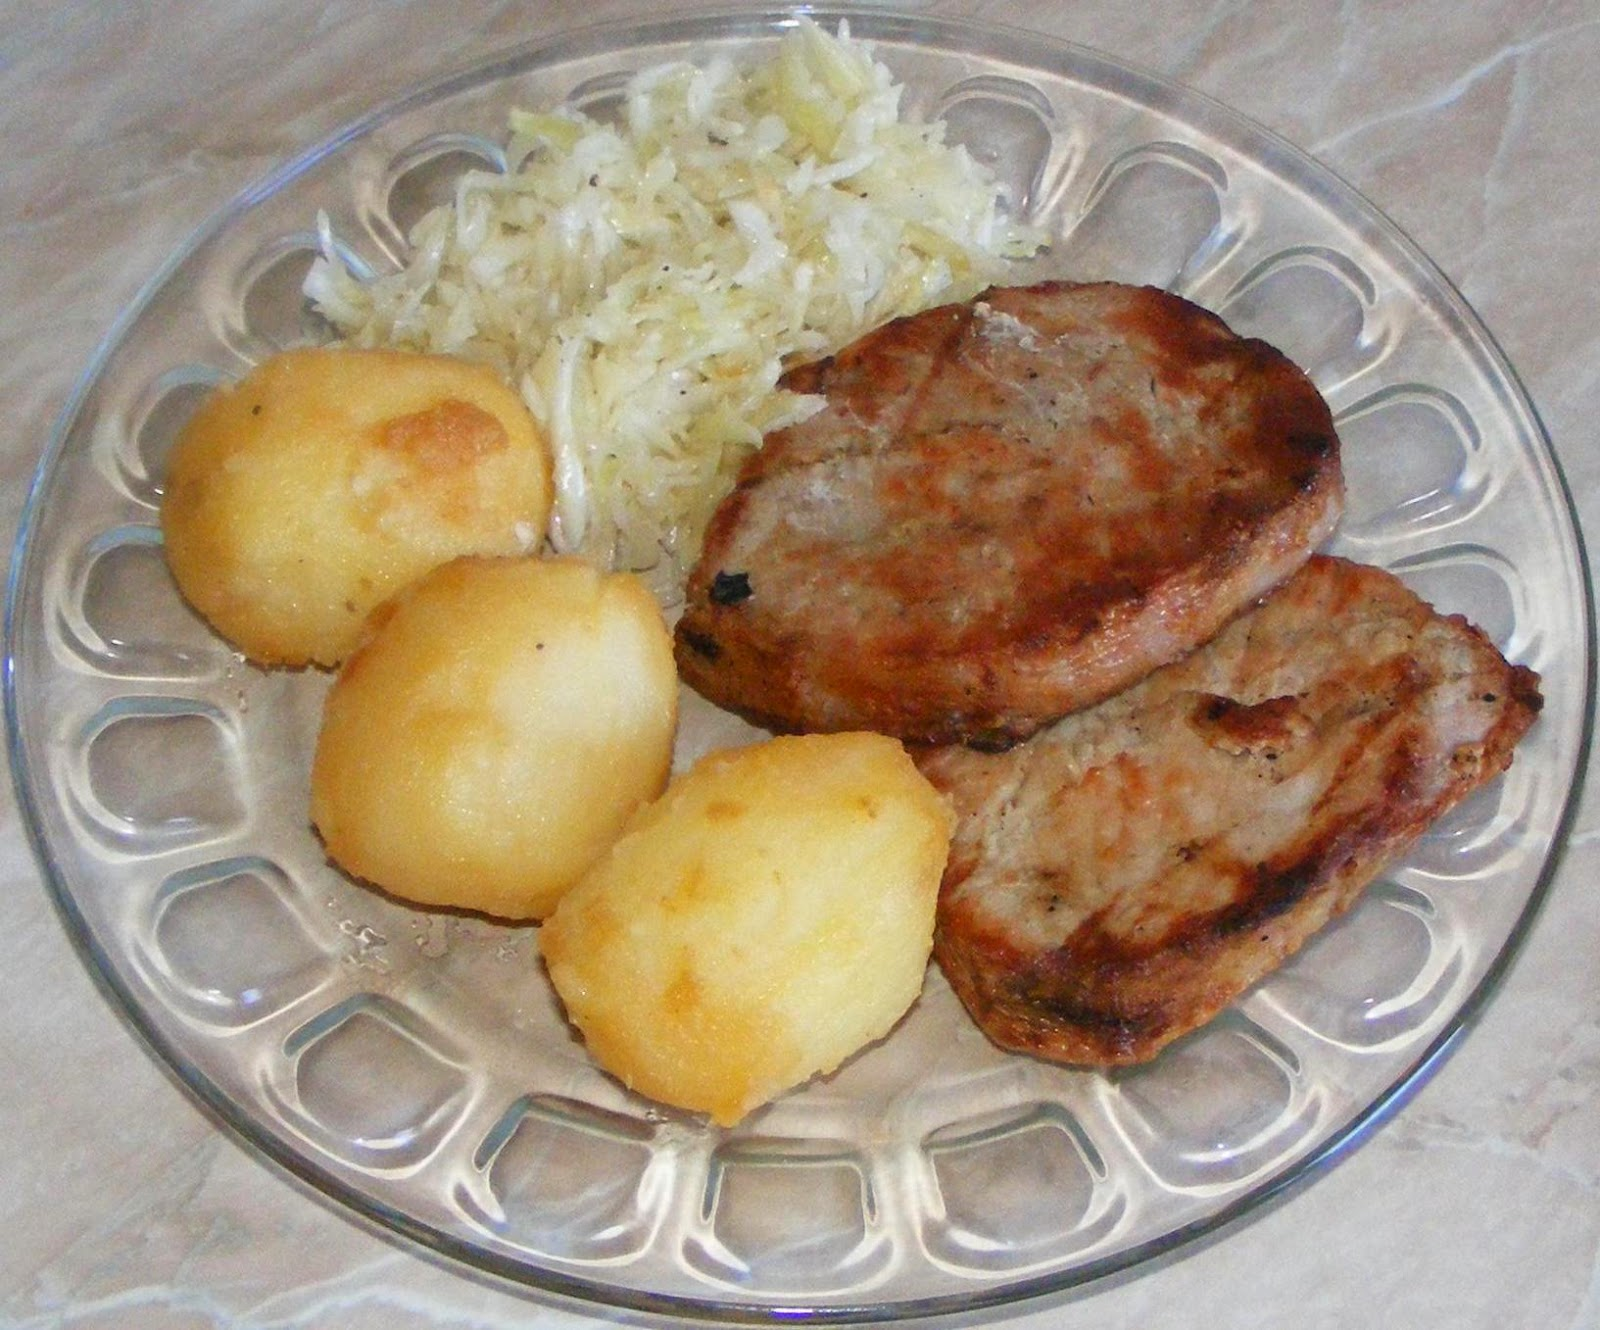 retete si preparate culinare friptura muschi de porc la gratar cu cartofi inabusiti, muschi de porc la gratar, friptura de porc, retete de mancare, retete cu porc, retete gratar, friptura de porc cu salata de varza,